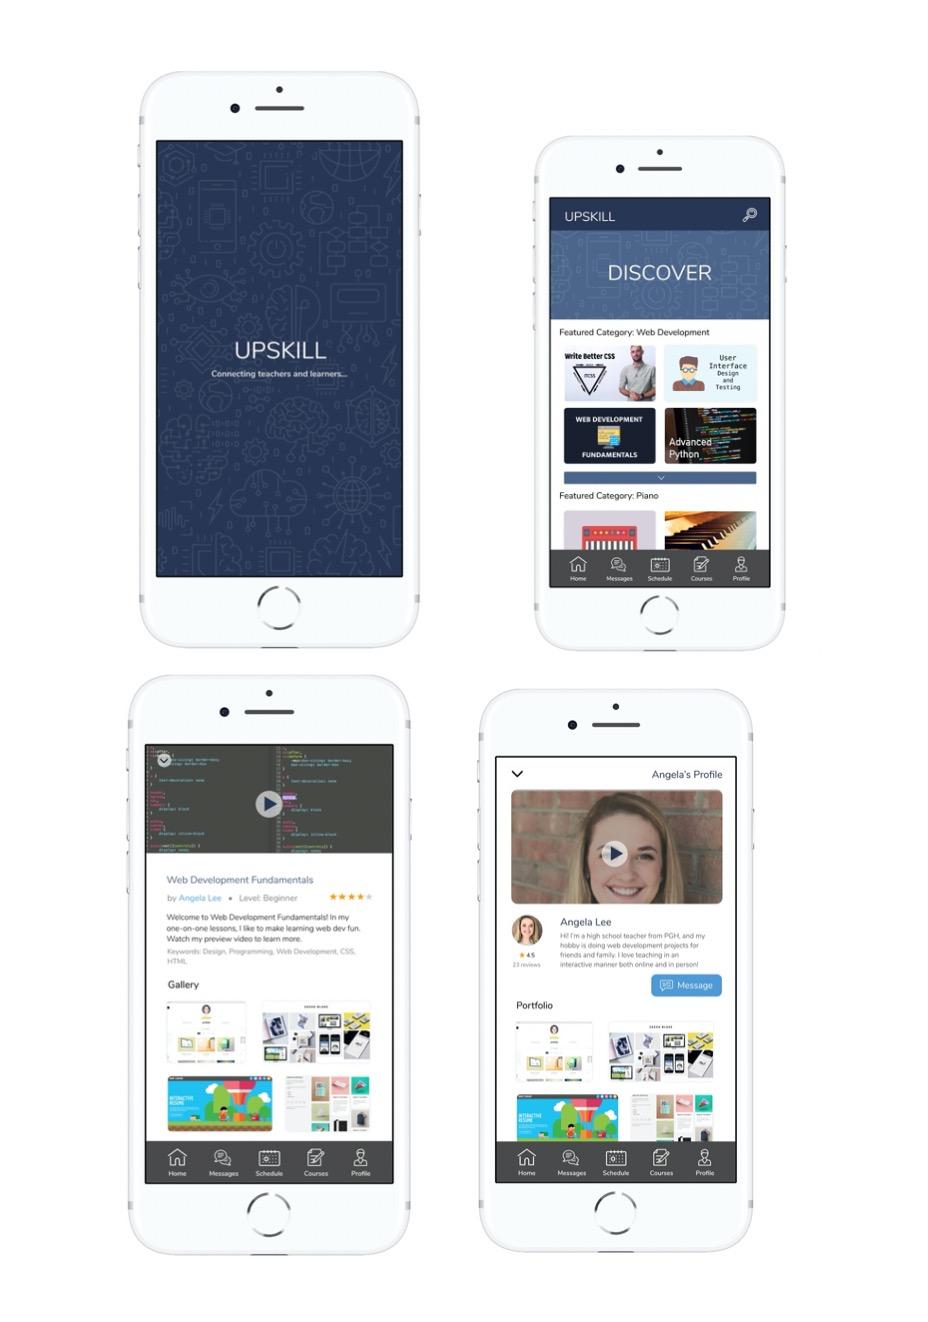 UpSkill Mobile app – Case Study